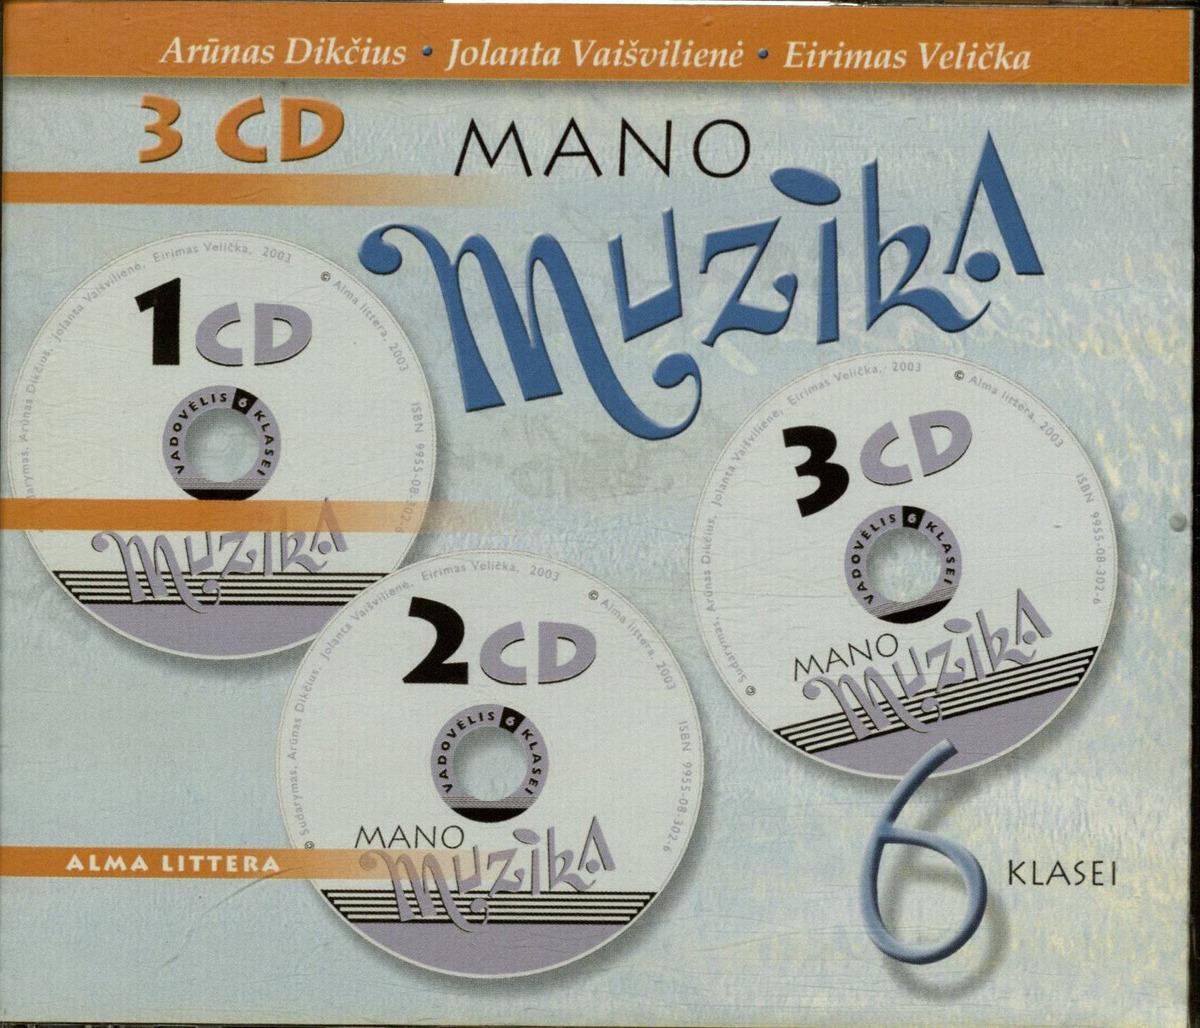 Mano muzika: [Garso įrašas]. 1 diskas. Vilnius, 2003.